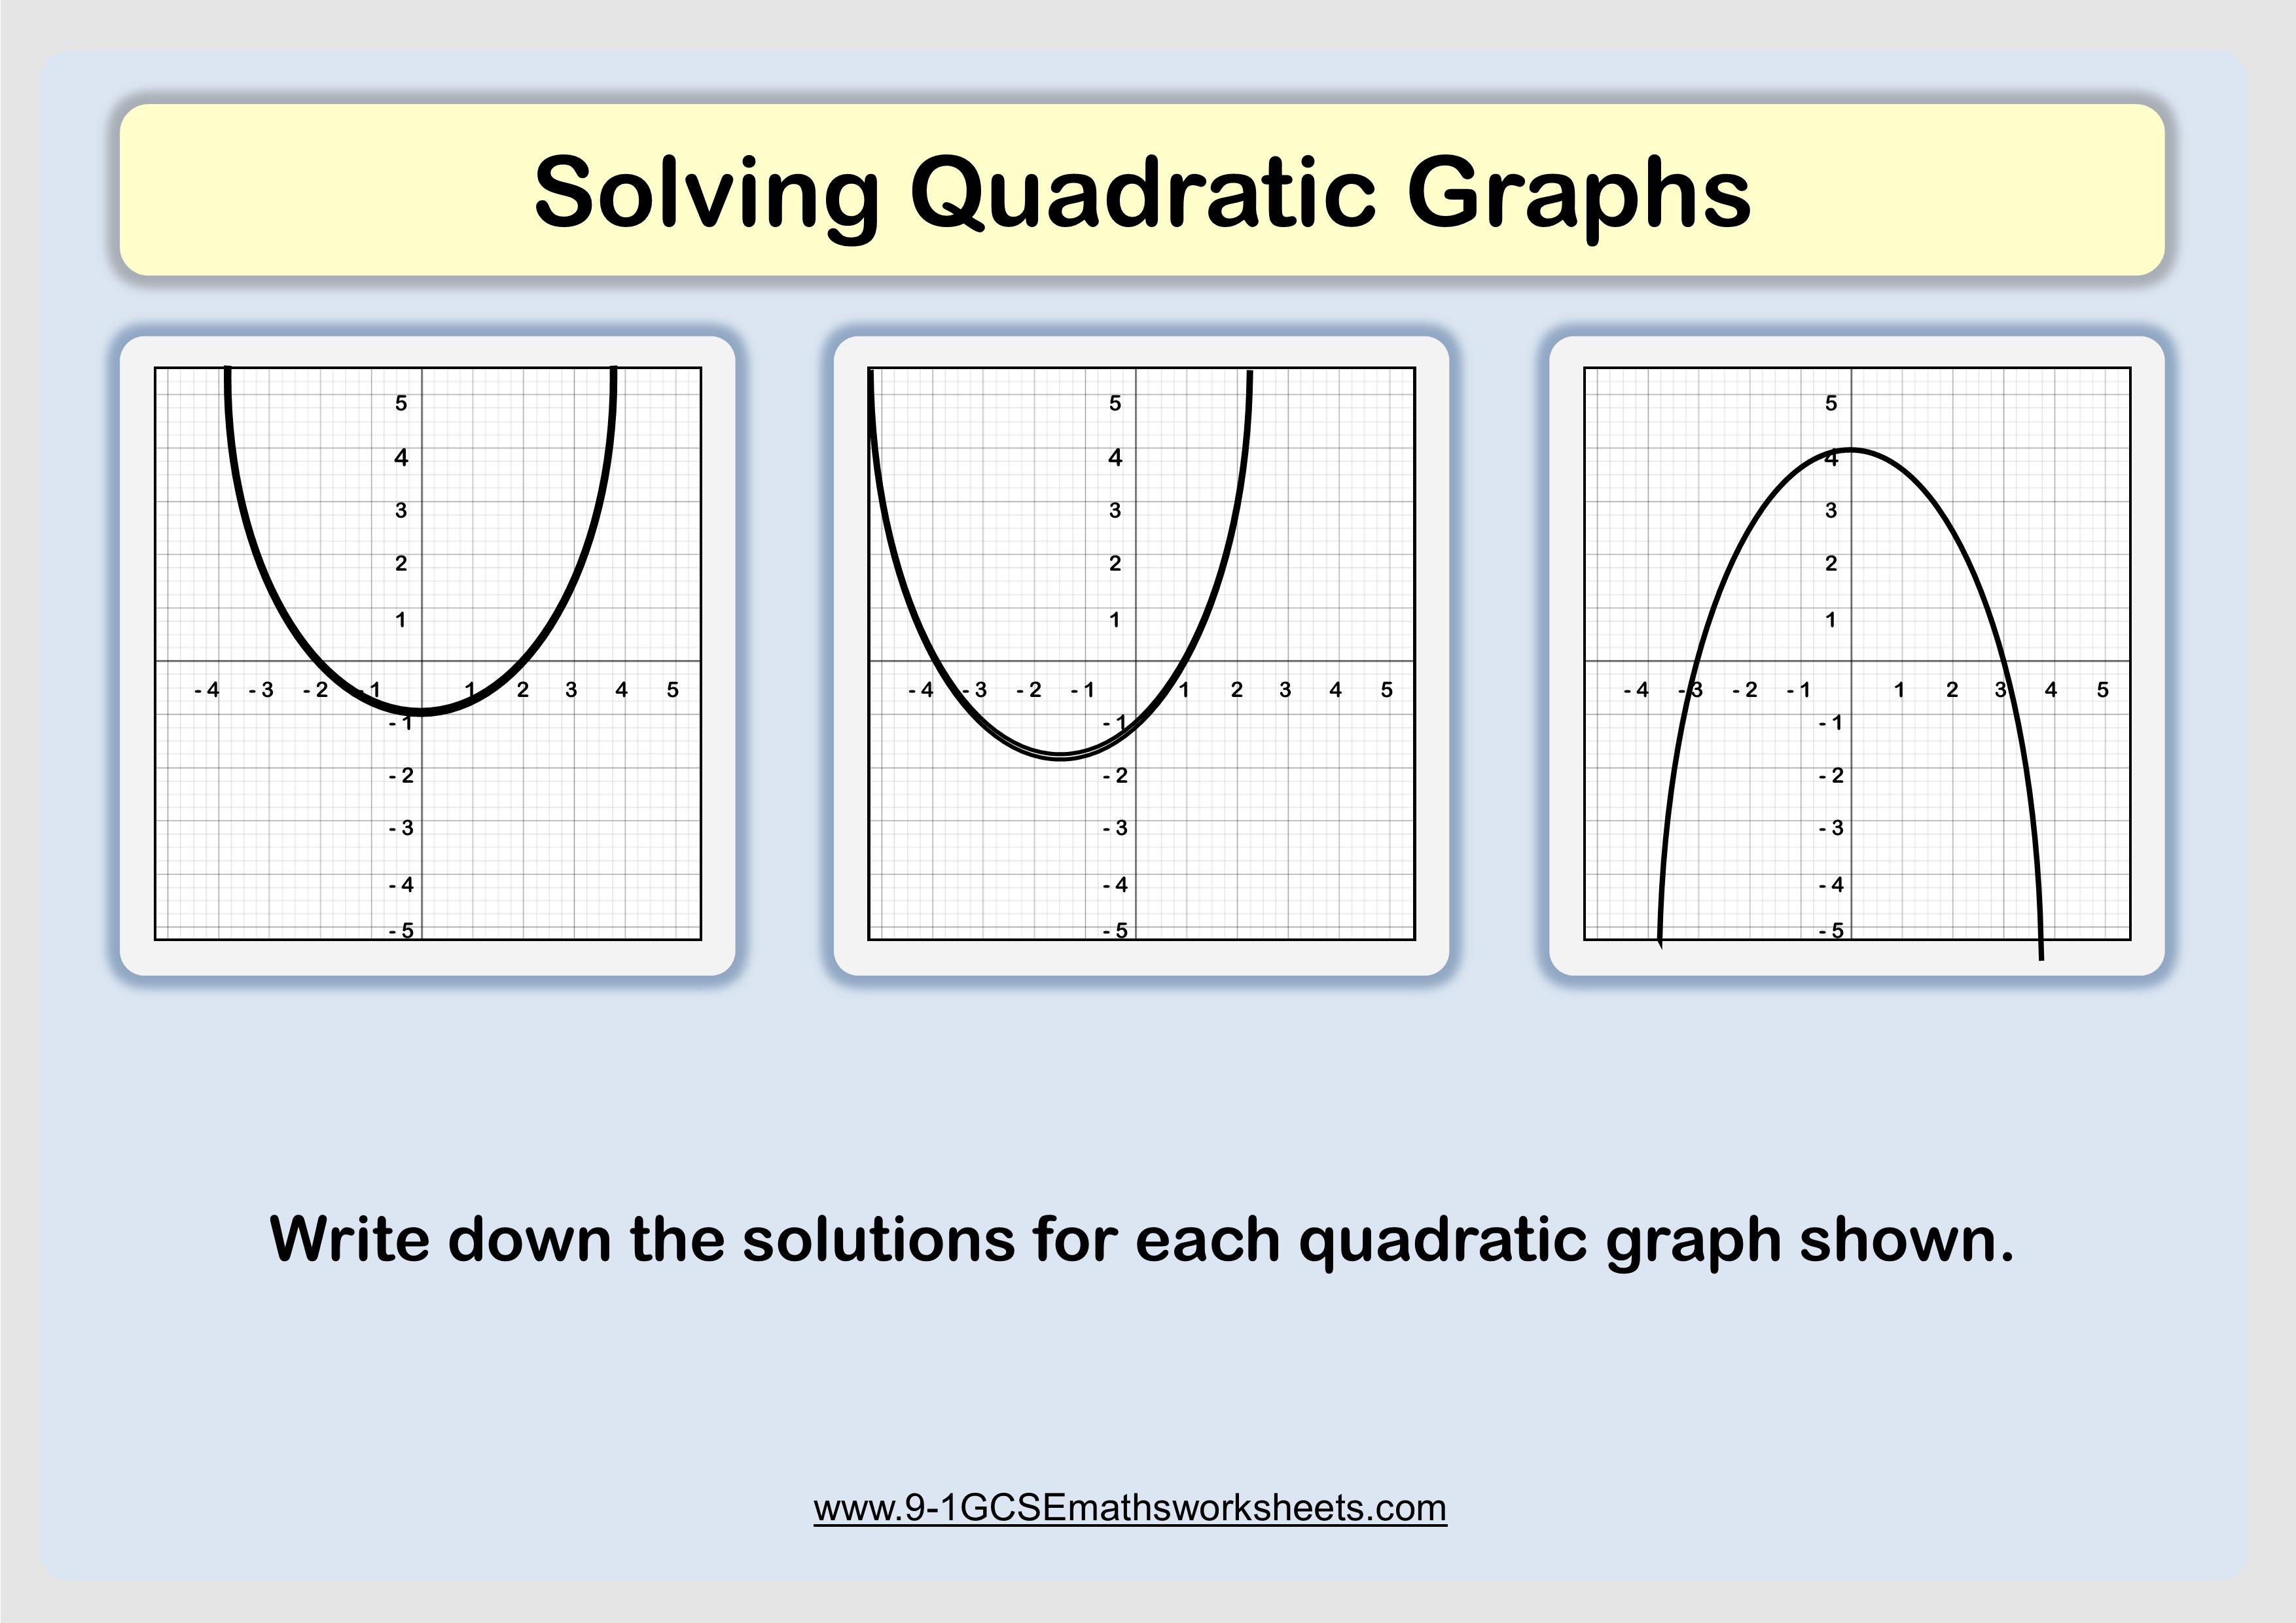 Solving Quadratic Graphs Example For Shading Regions Of